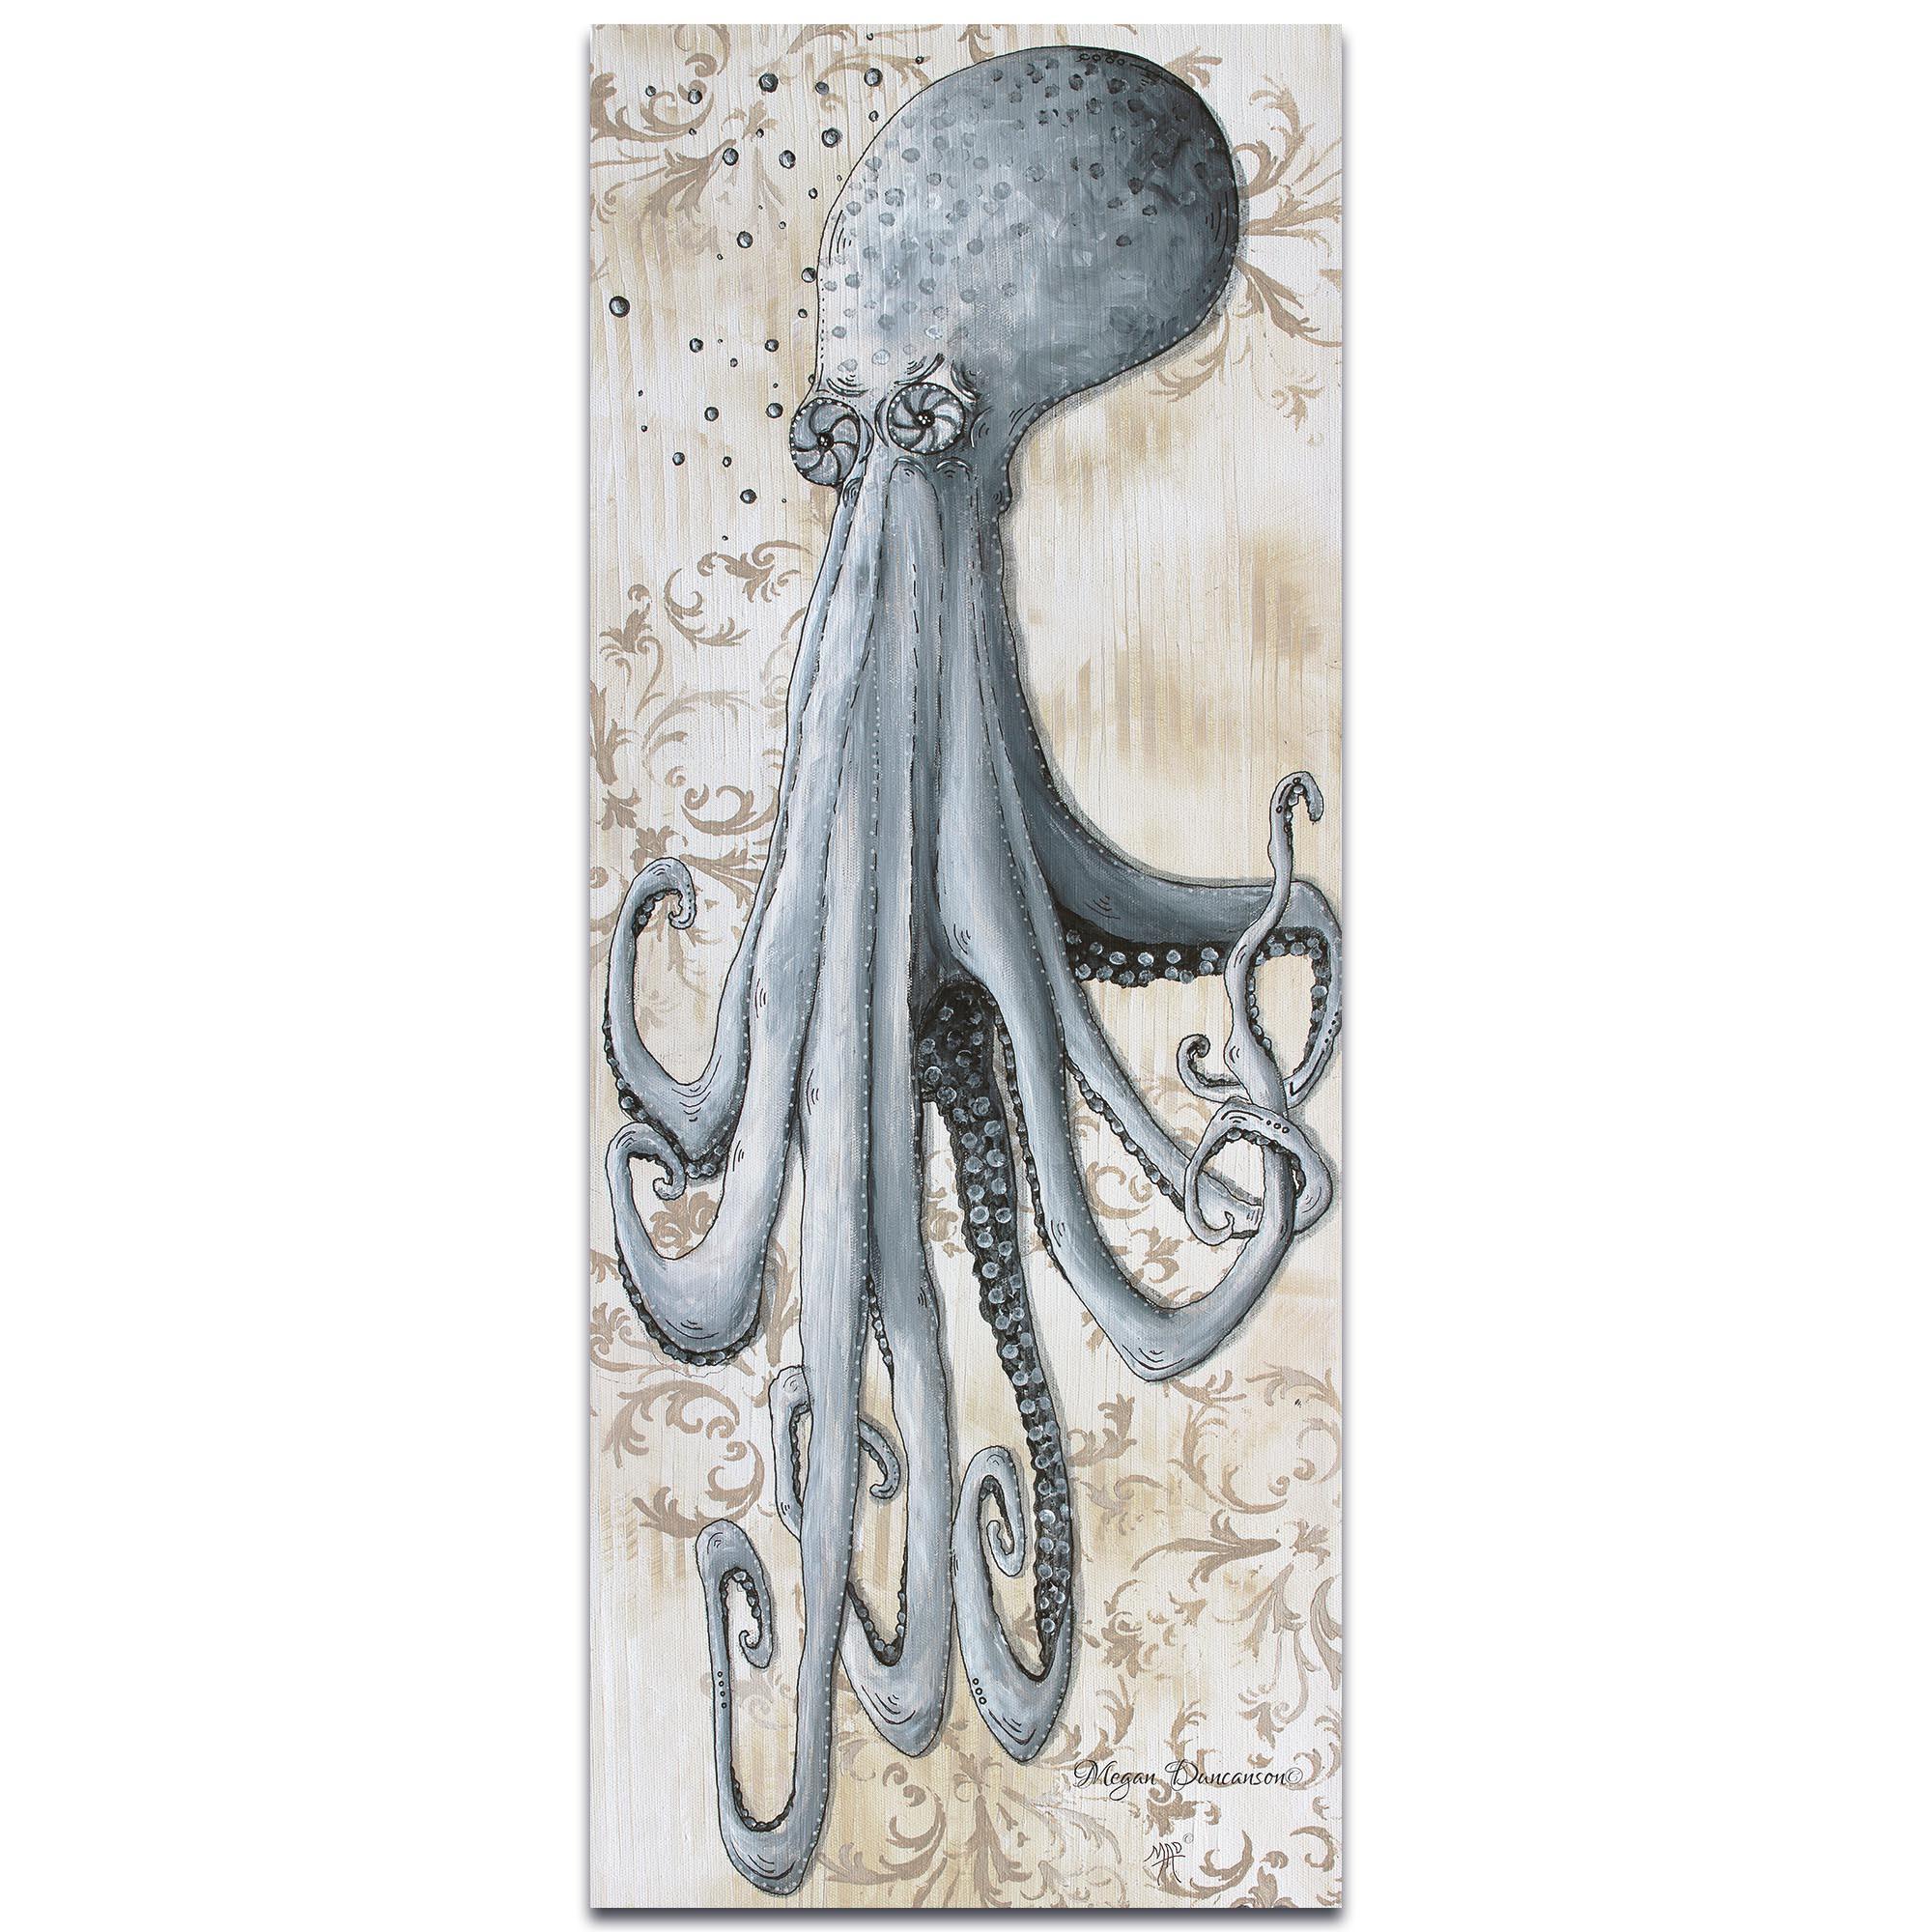 Modern Beach Decor 'Depths of the Sea v2' - Coastal Bathroom Art on Metal or Acrylic